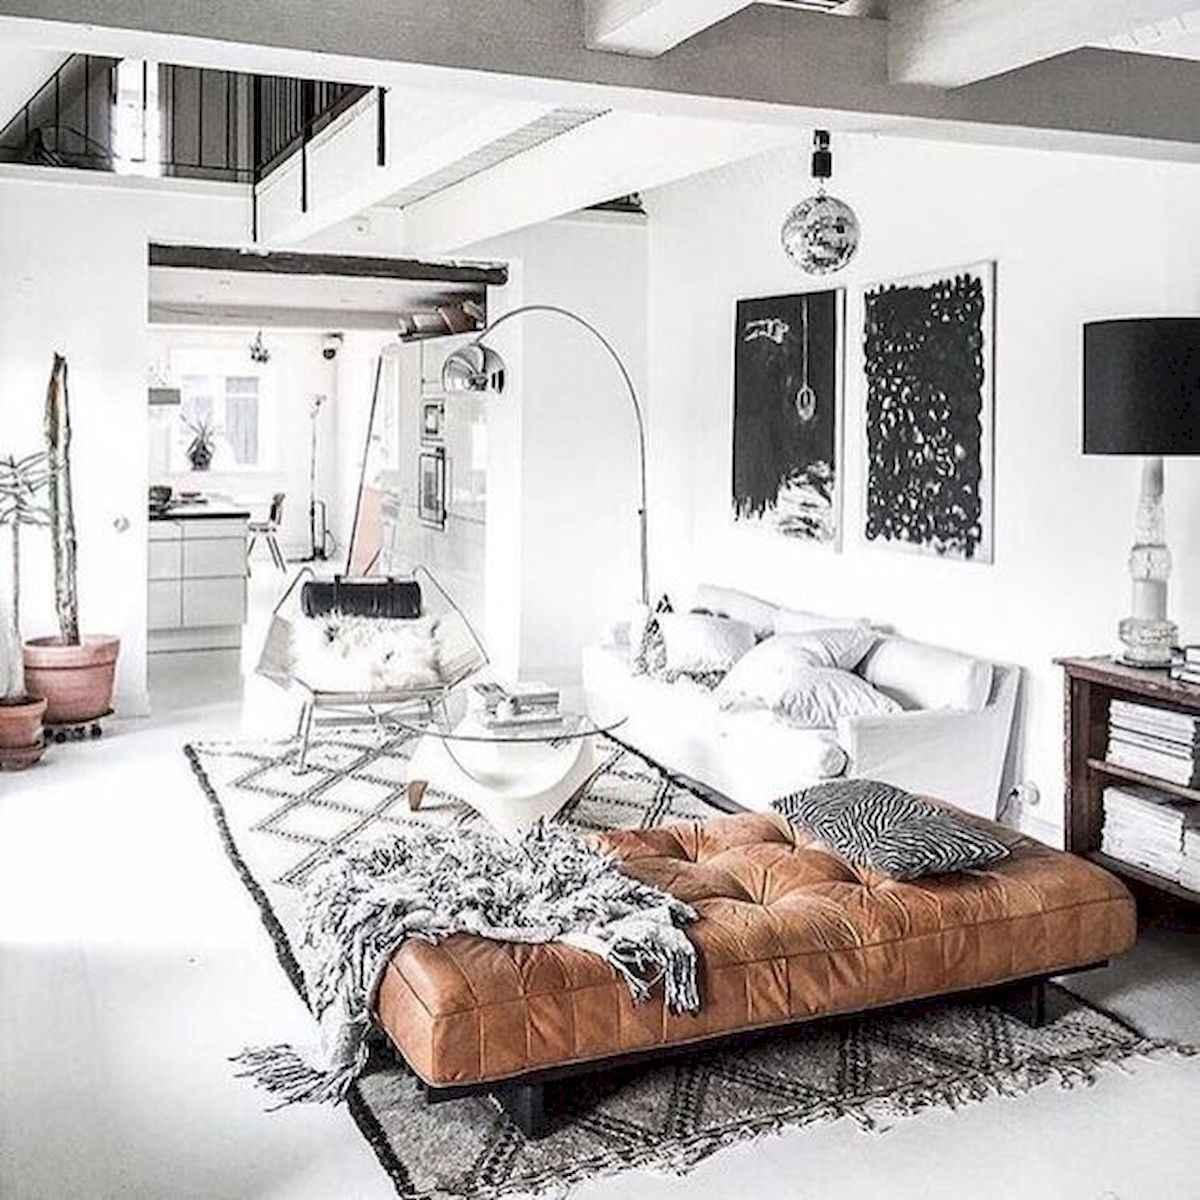 Decor Ideas: 40 Rustic Studio Apartment Decor Ideas